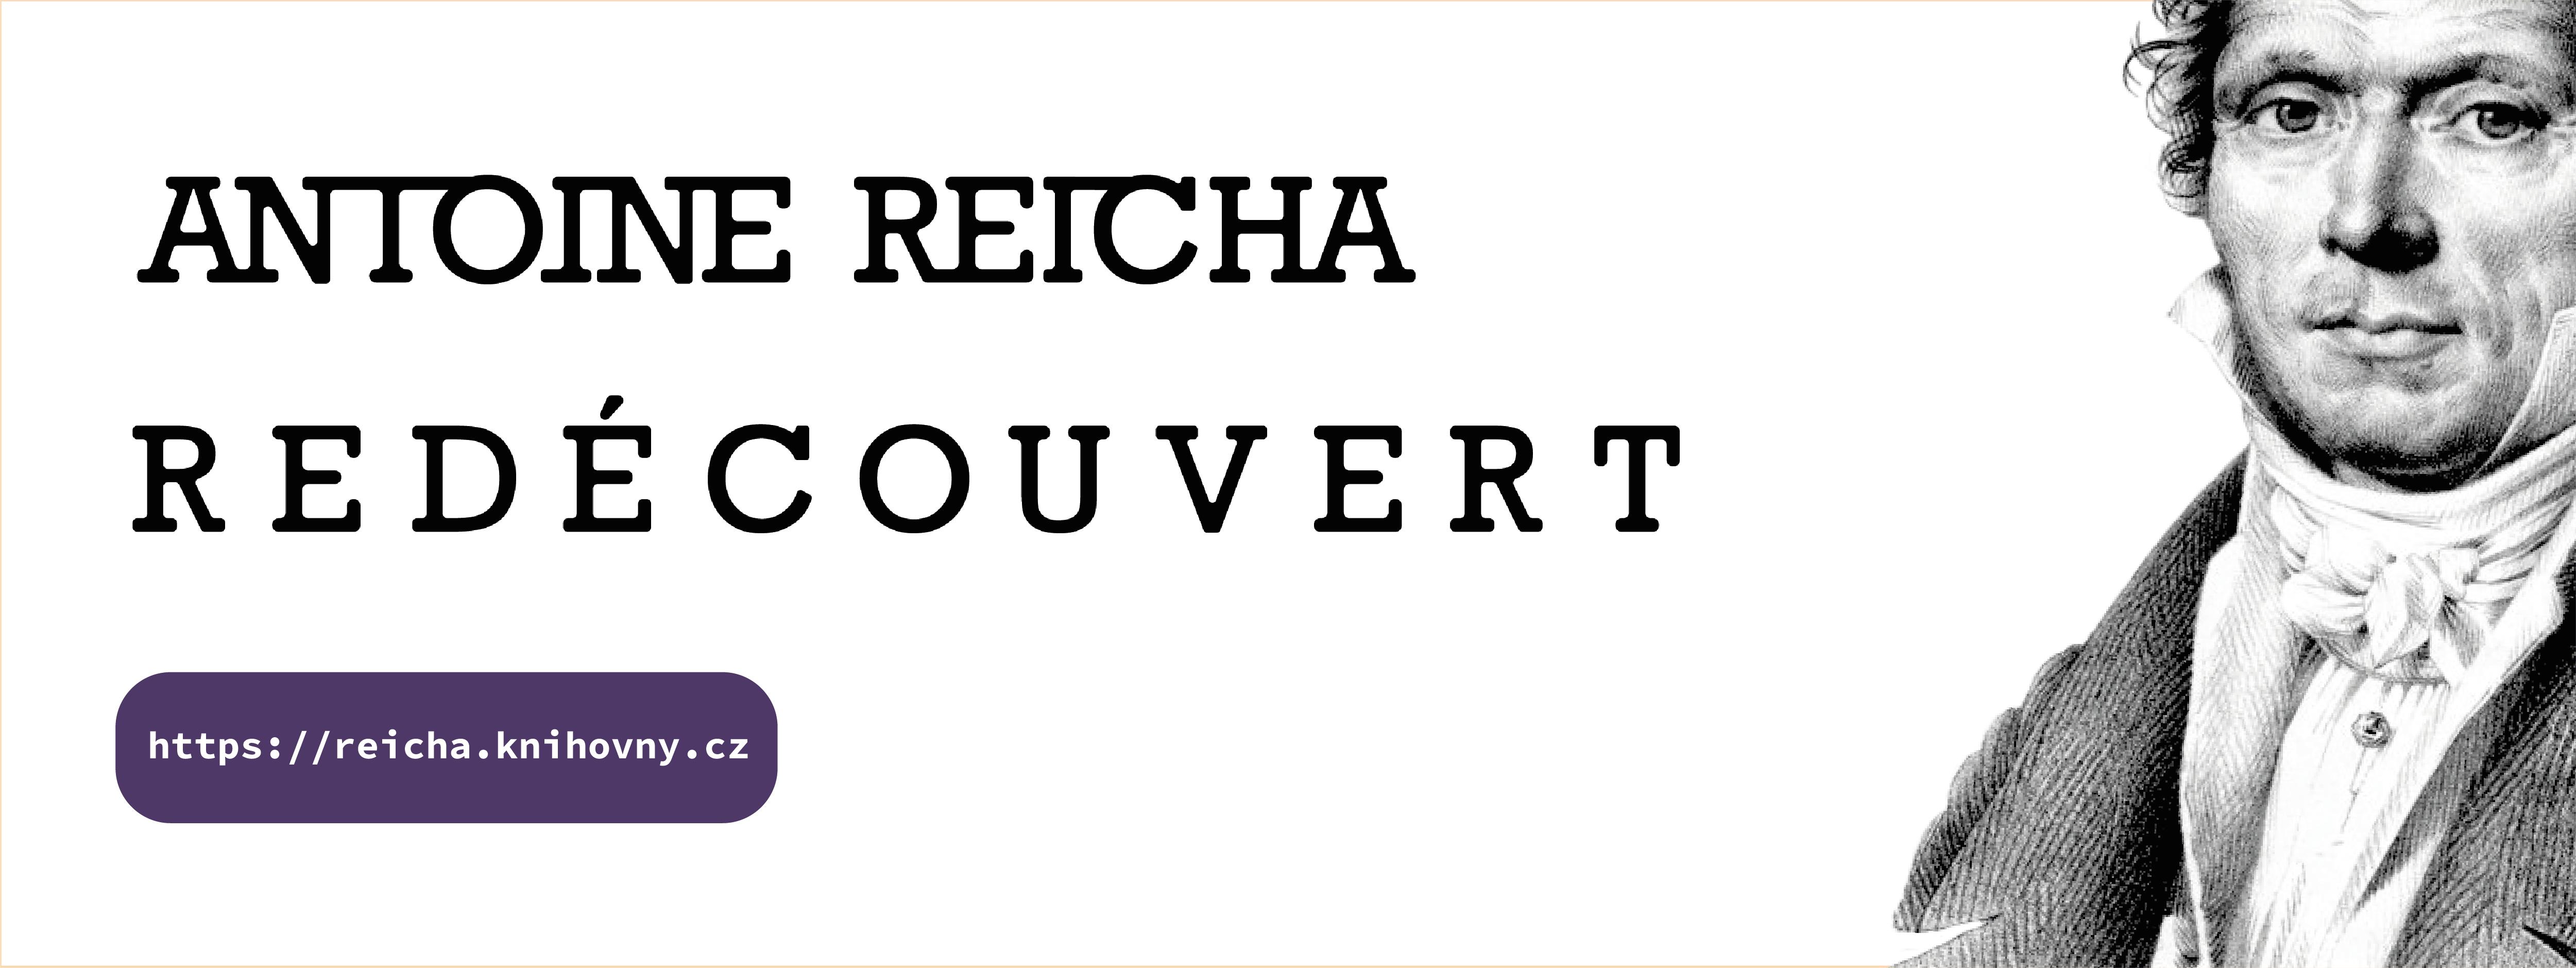 Exposition virtuelle Antoine Reicha redécouvert